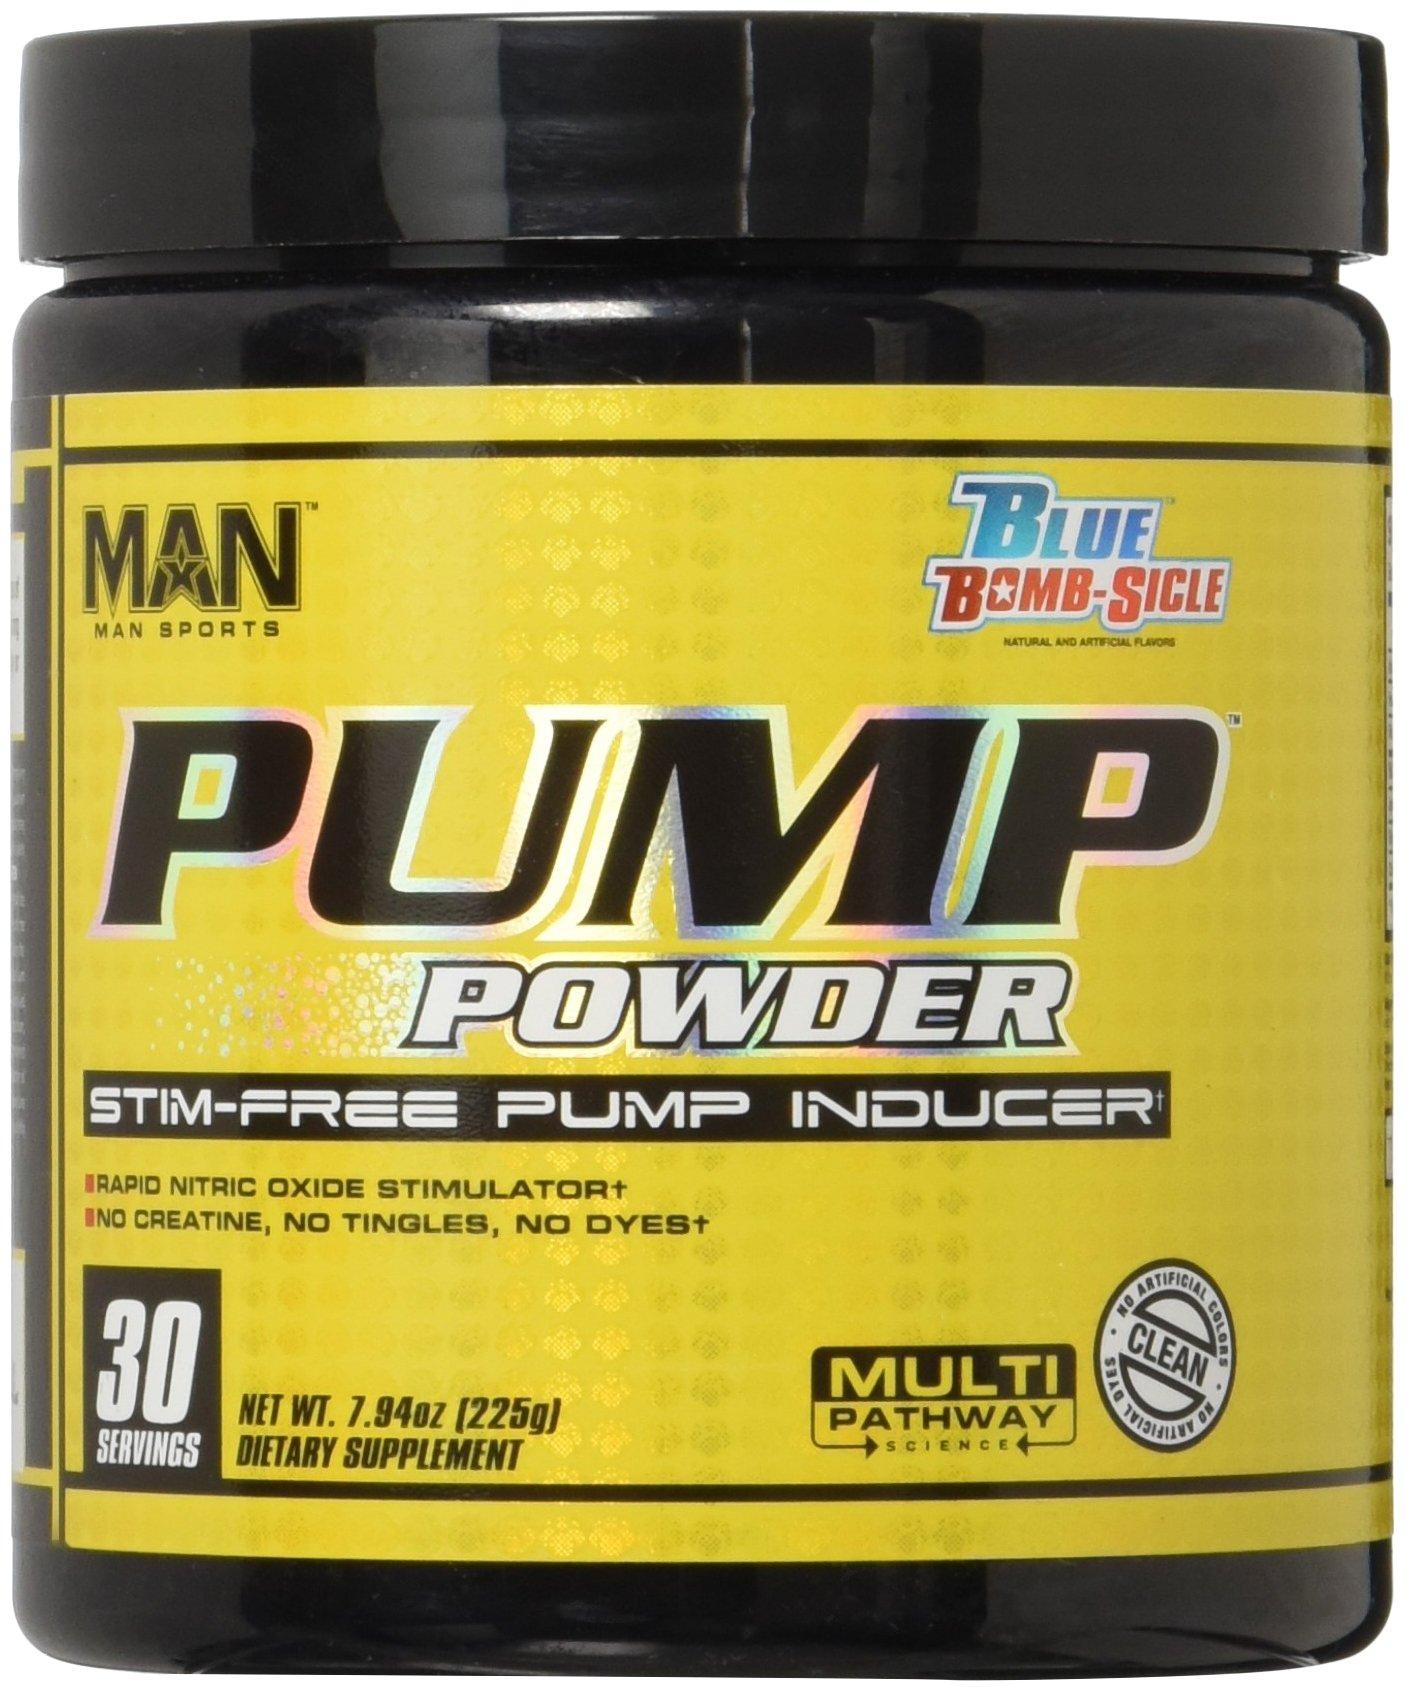 MAN Sports Pump Powder Stimulant-Free Pre-Workout Nitric Oxide Supplement, Blue Bomb-Sicle, 30 Servings, 225 Grams